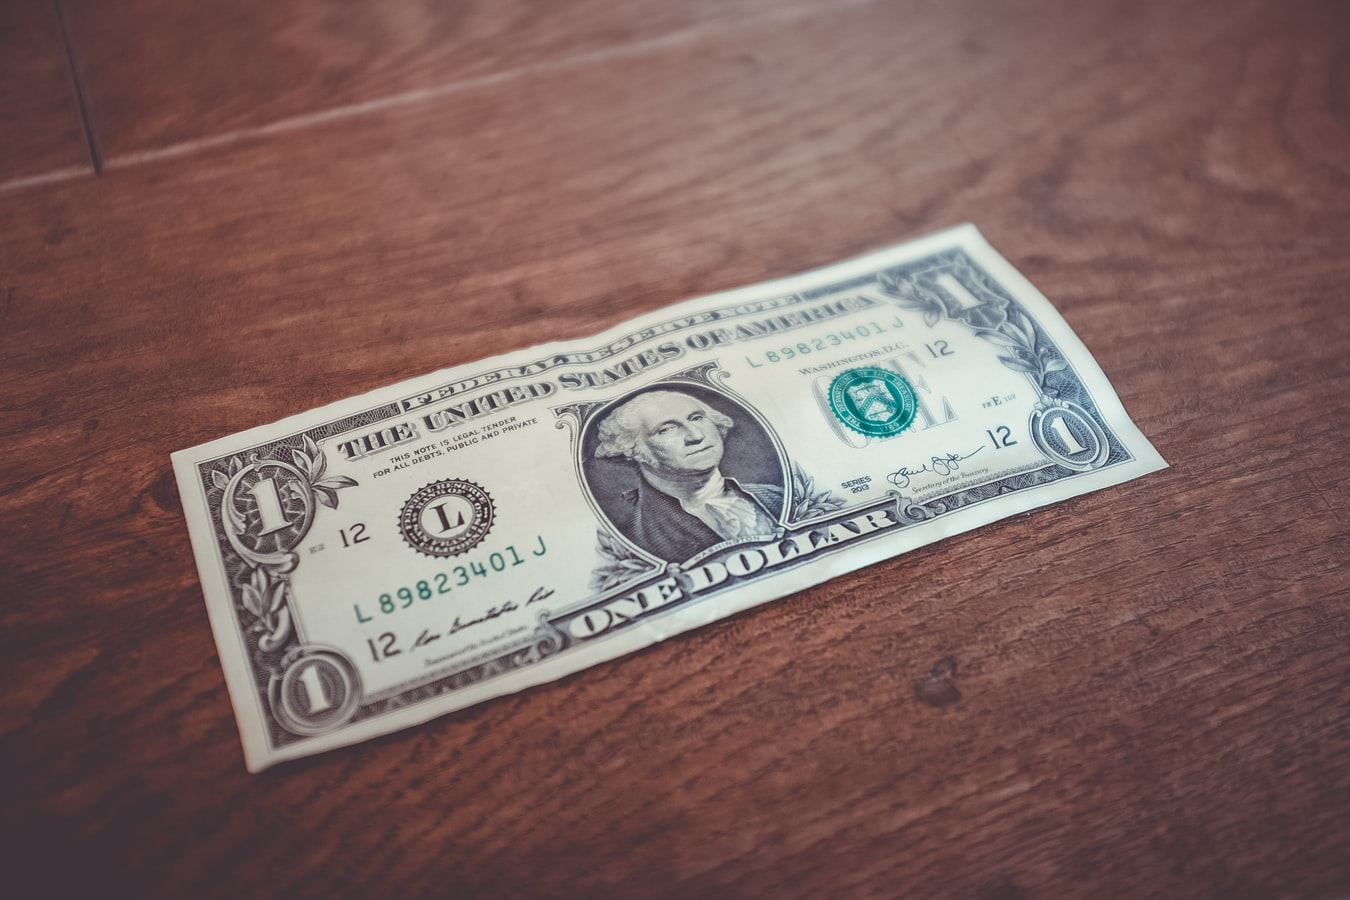 1 dollar bill on wood surface